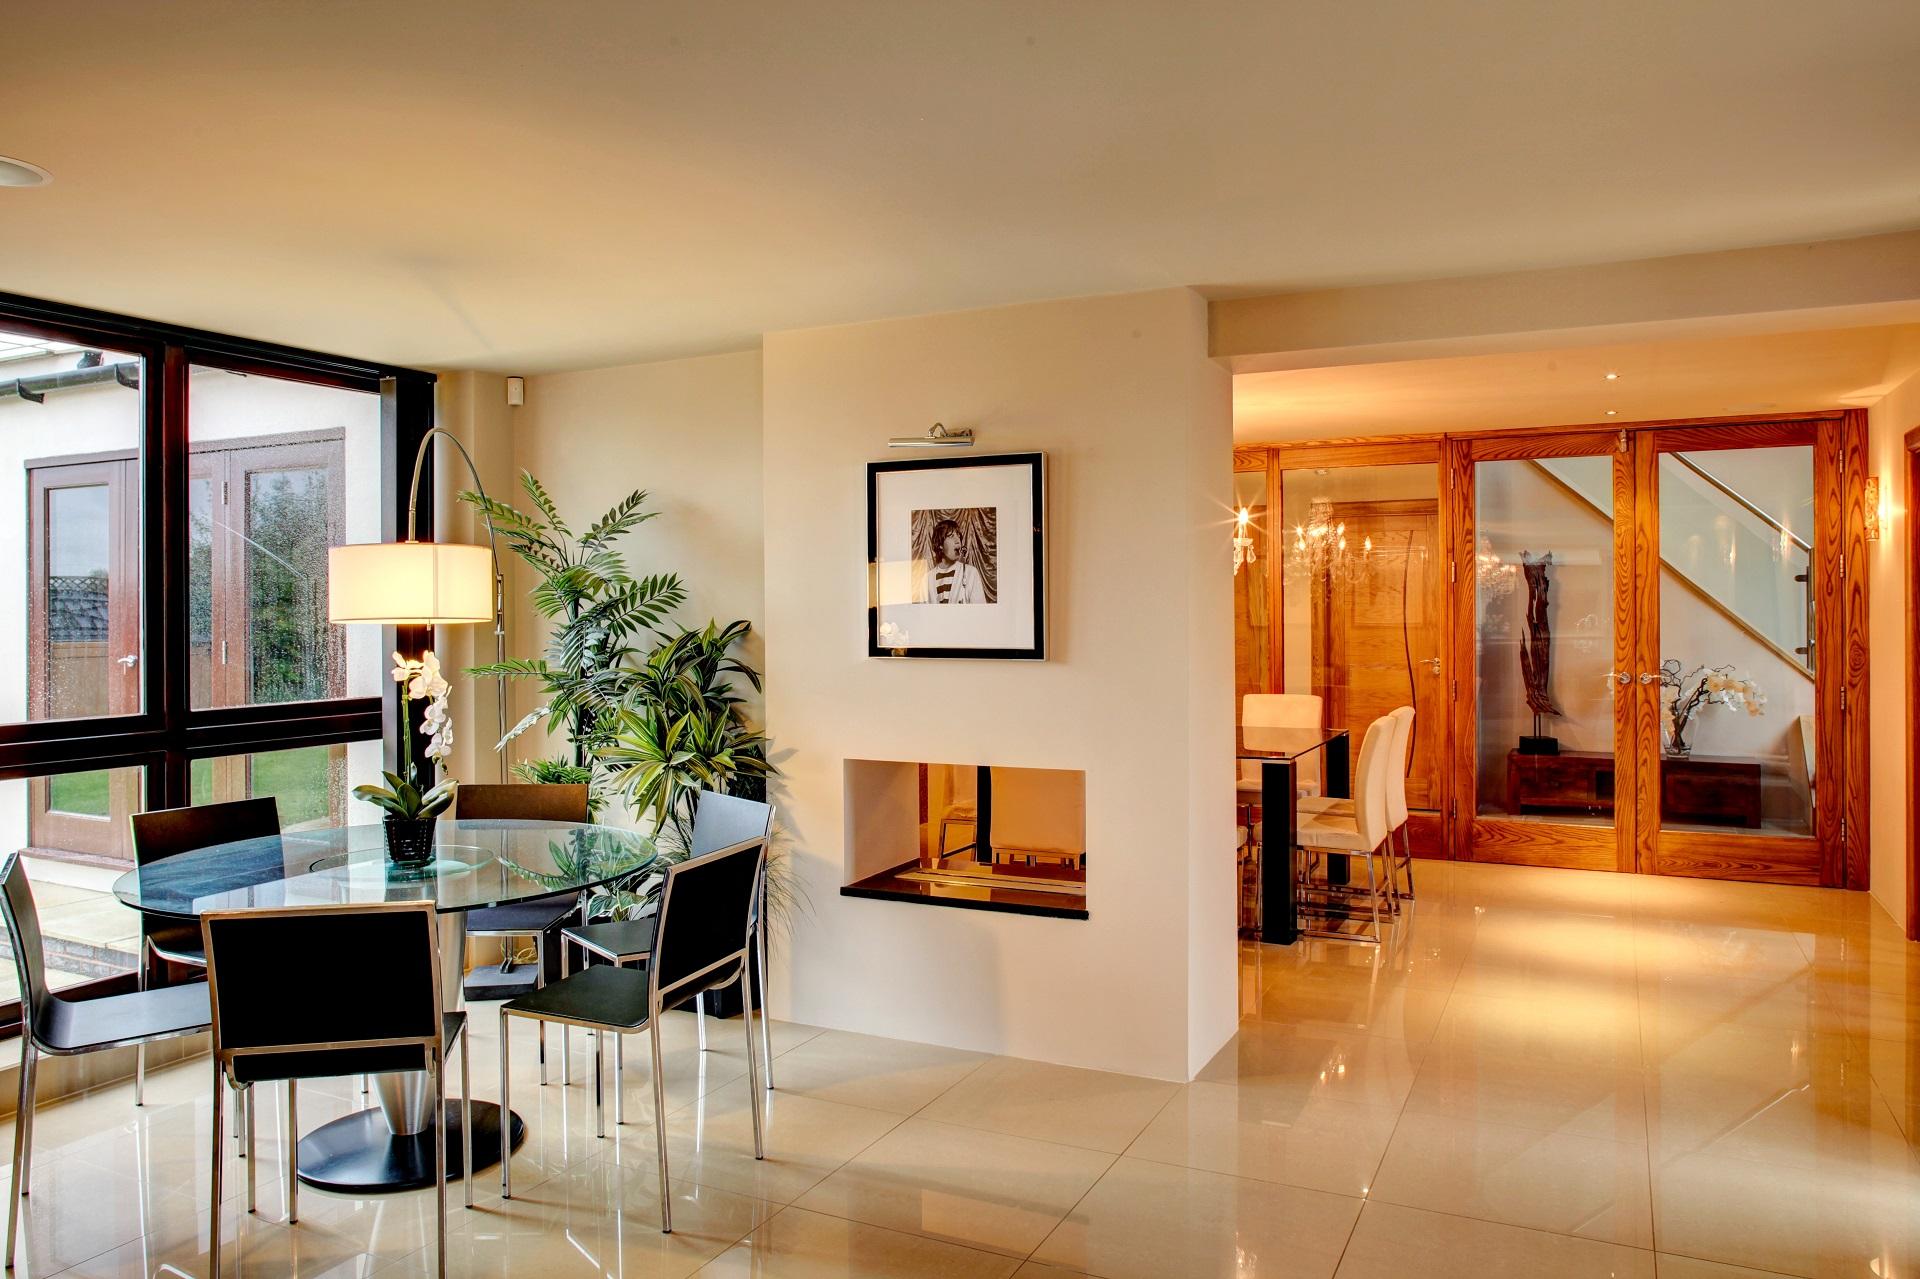 luxury design at fern hill nottingham, Interior design, dining room, open plan kitchen